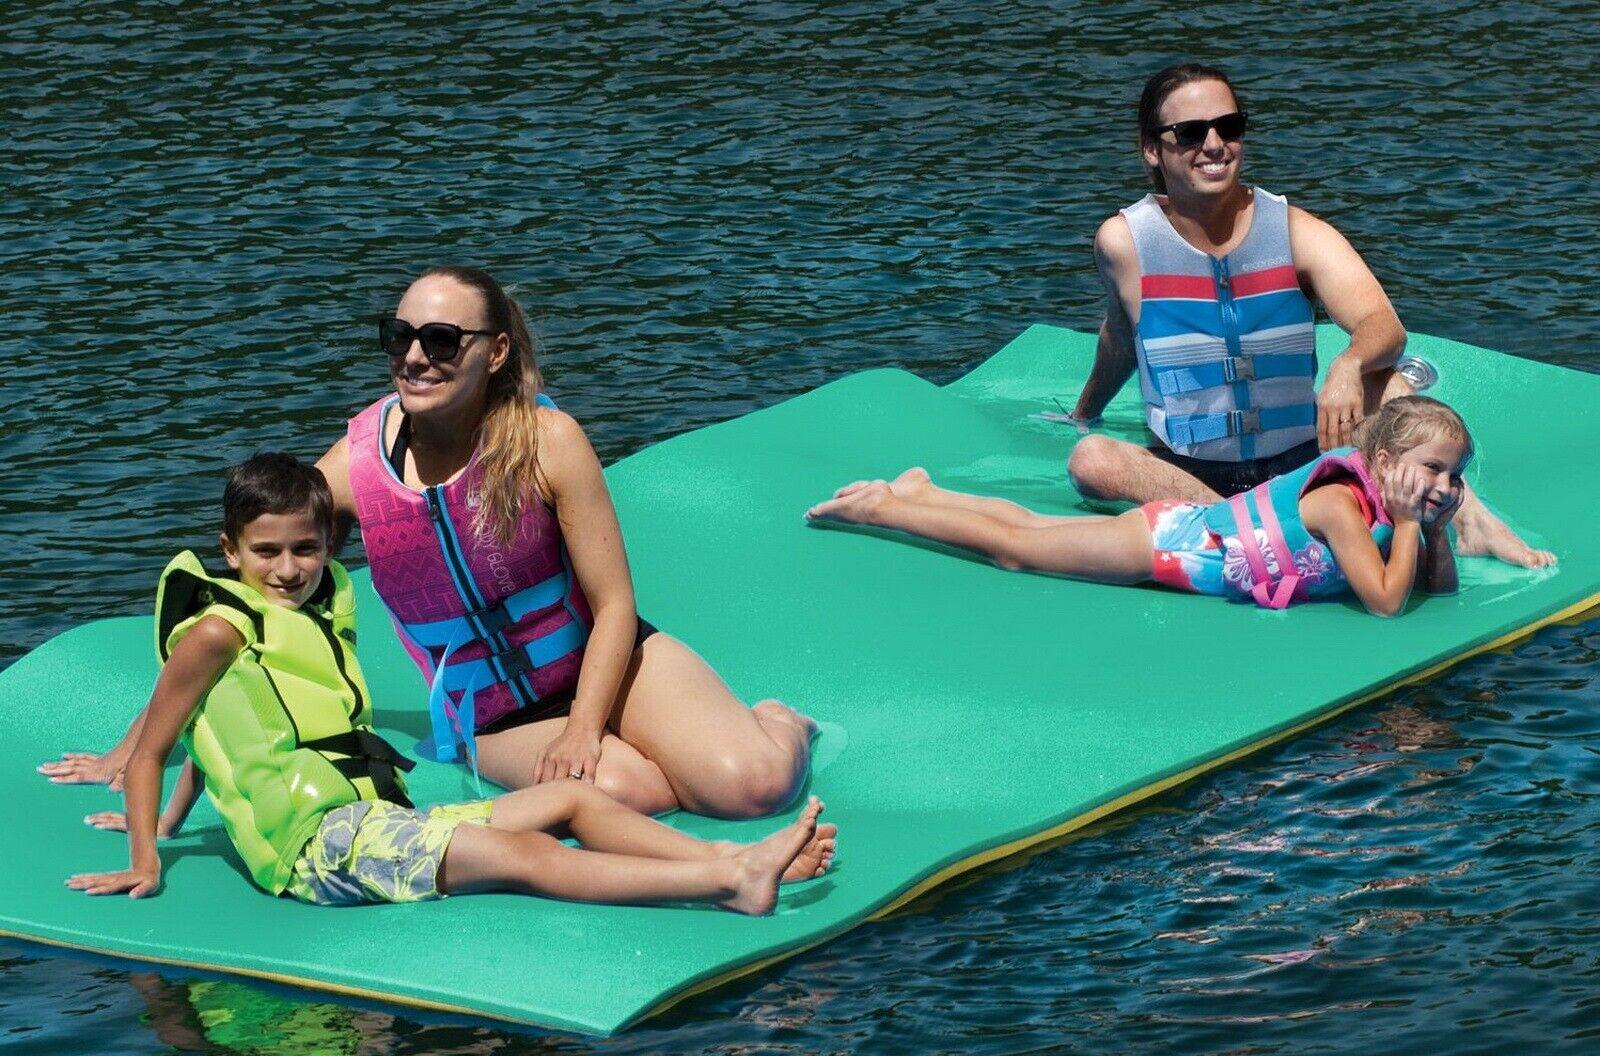 Image 8 - Huge 7 Person Floating Oasis Foam Raft Lake Sea Water Pad Mat 15' x 6' 1,500 lbs